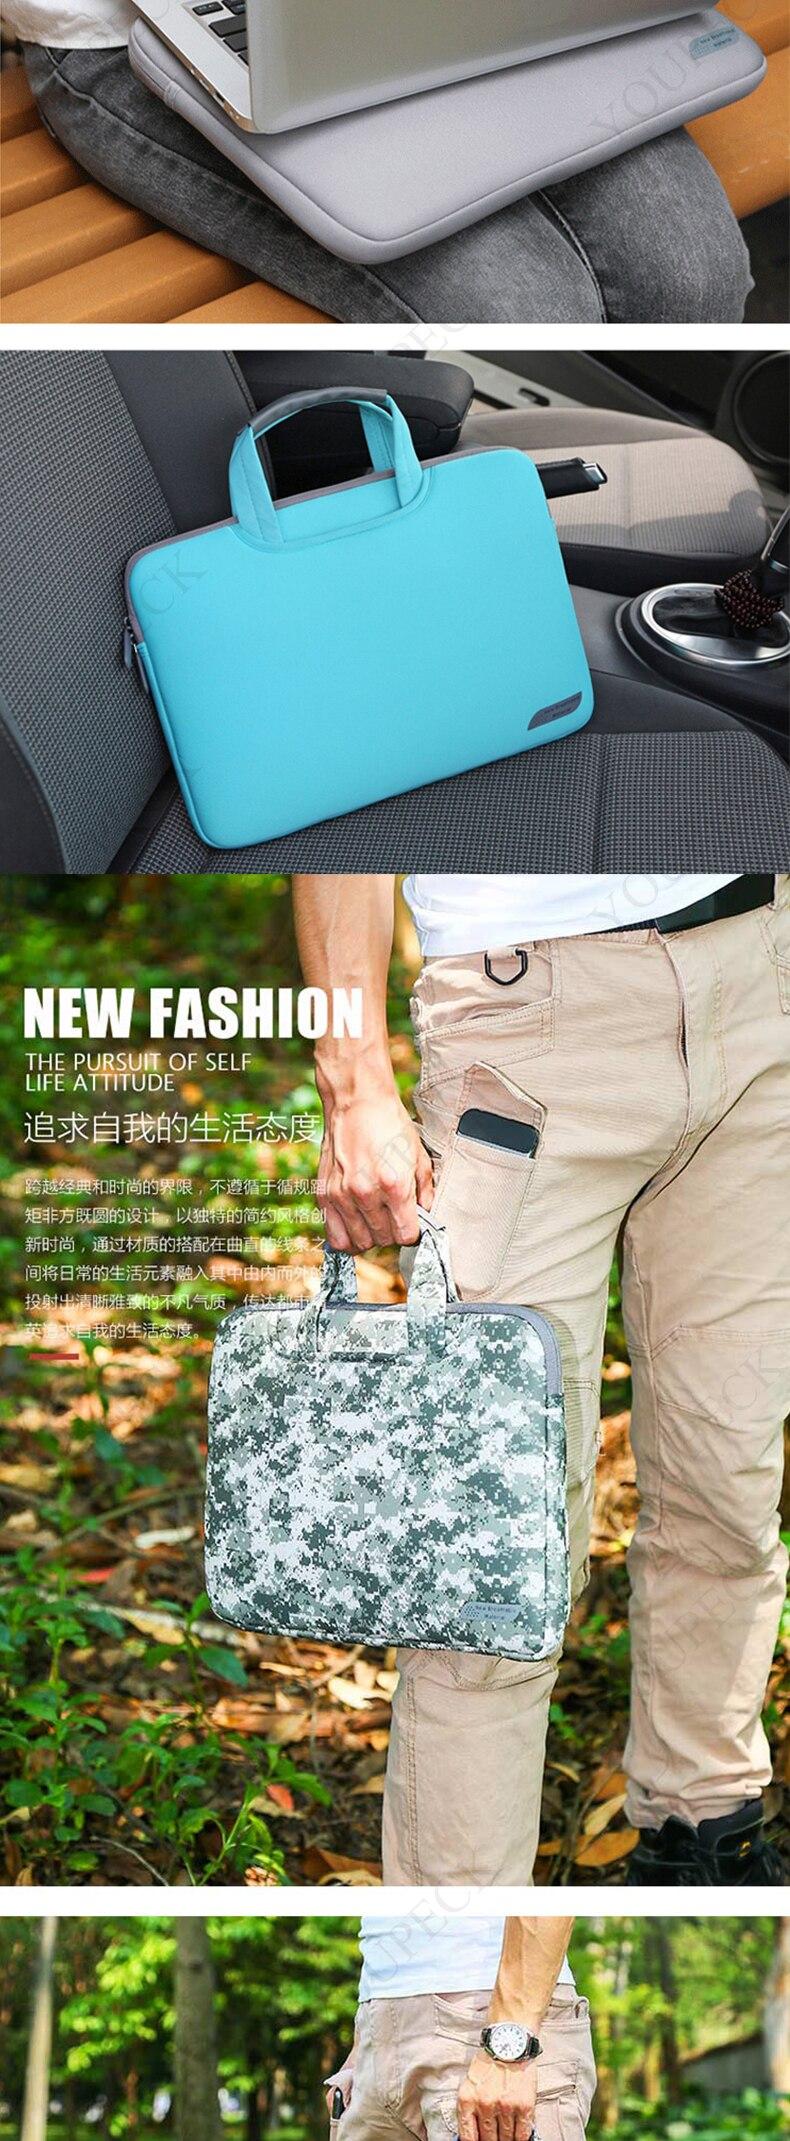 Breathable Laptop Bag for Macbook Air 13 12 Pro 13 Case Sleeve Women Men Protective Bag for Mac book Touchbar 13 15 Case Cover